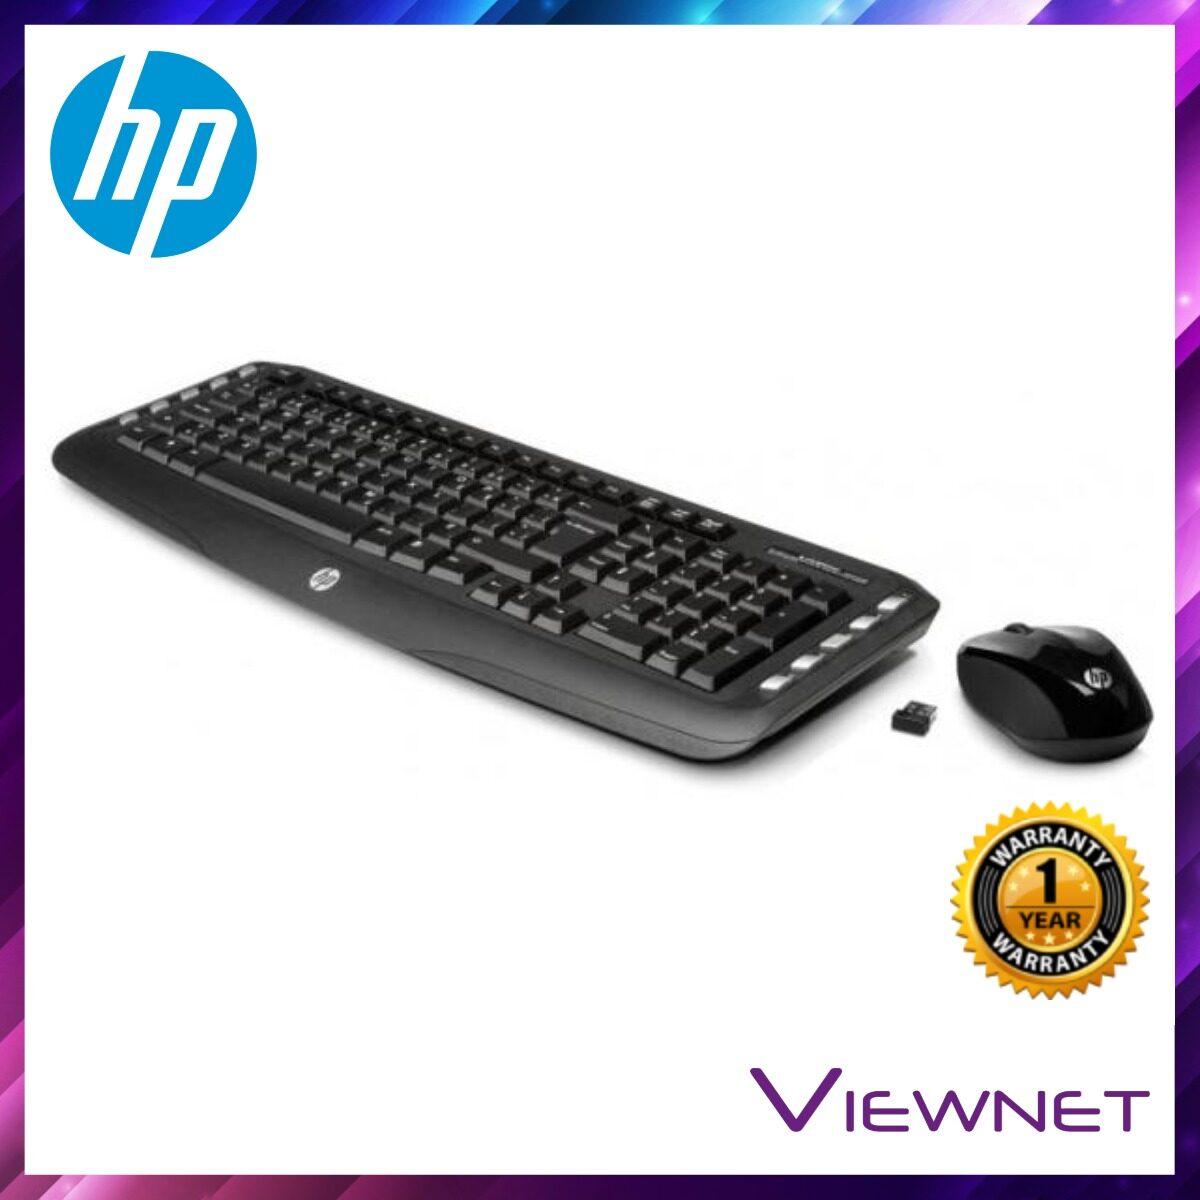 HP Wireless Classic Desktop Combo (J8F13AA#UUF), USB port, Compatible across Windows XP/Vista/7/8